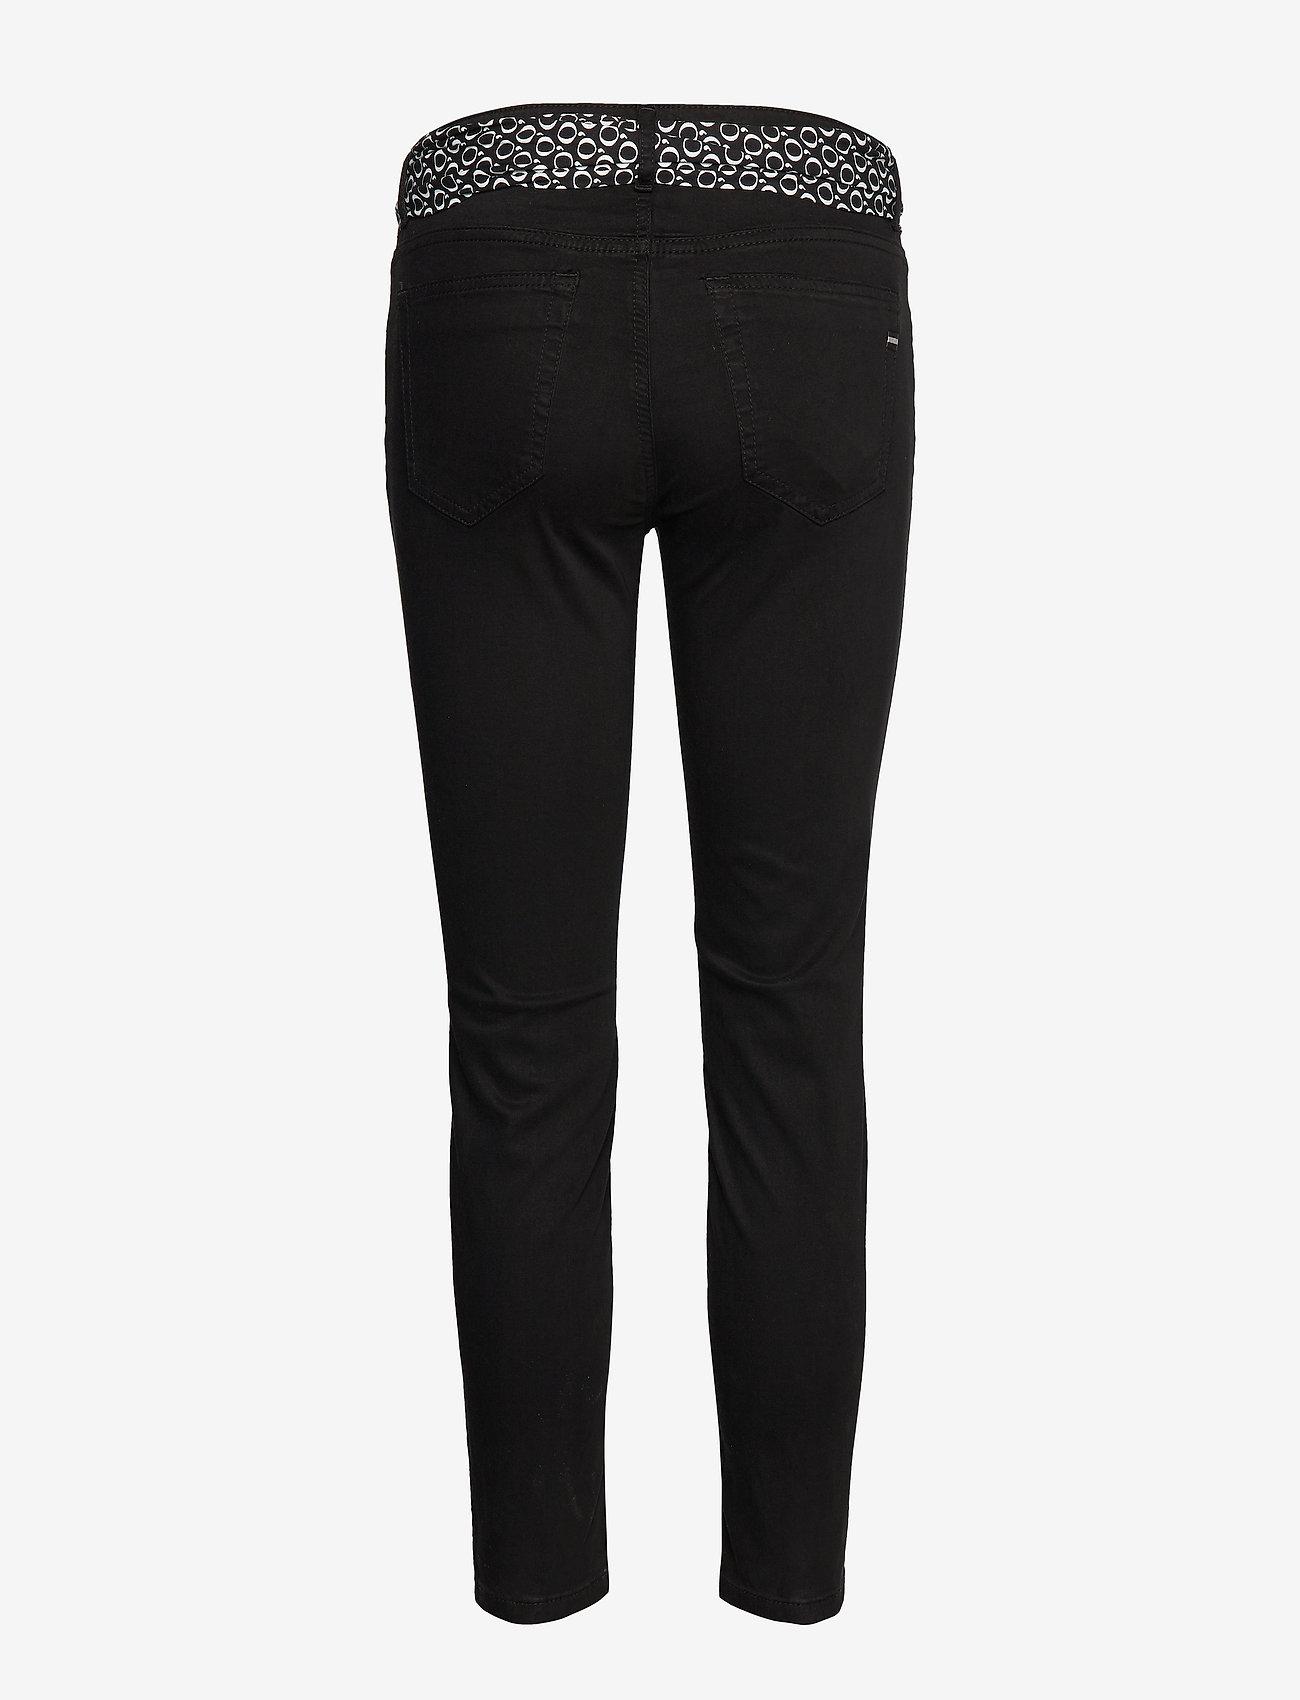 Jeans (Black) (103.96 €) - Marc O'Polo KQjoS